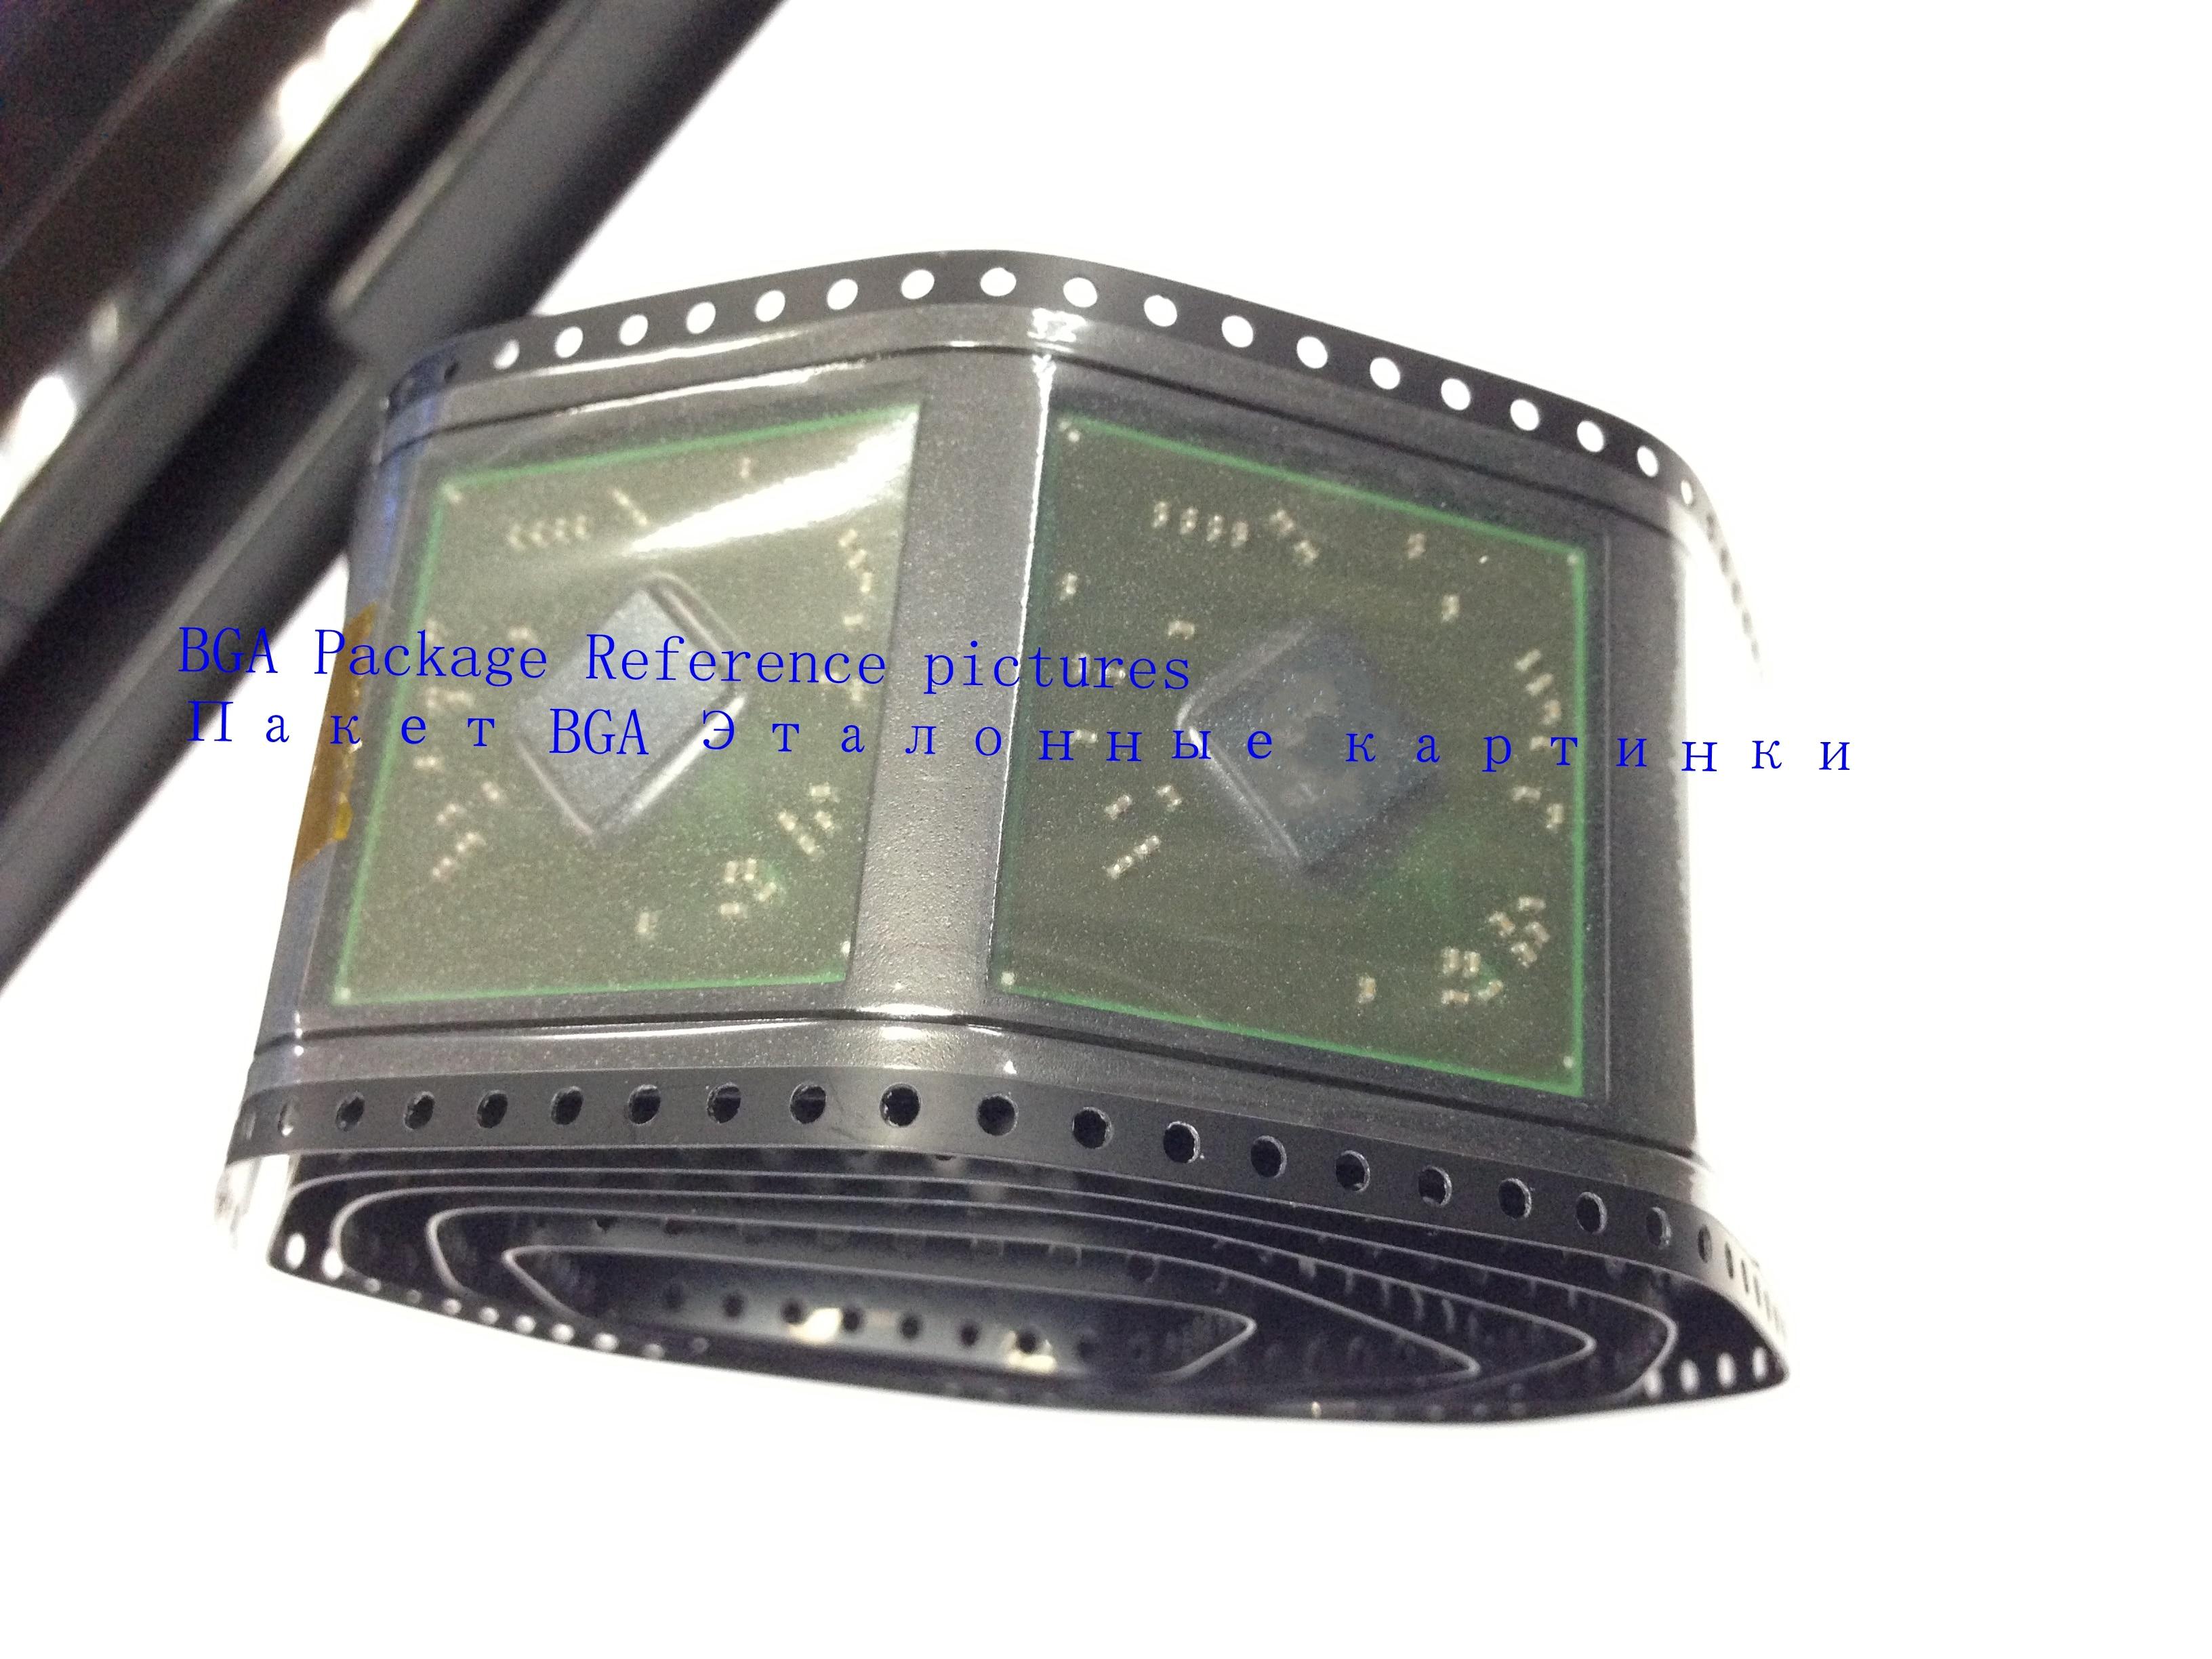 1pcs/lot 100% New 216-0846033 216 0846033 BGA Chipset1pcs/lot 100% New 216-0846033 216 0846033 BGA Chipset